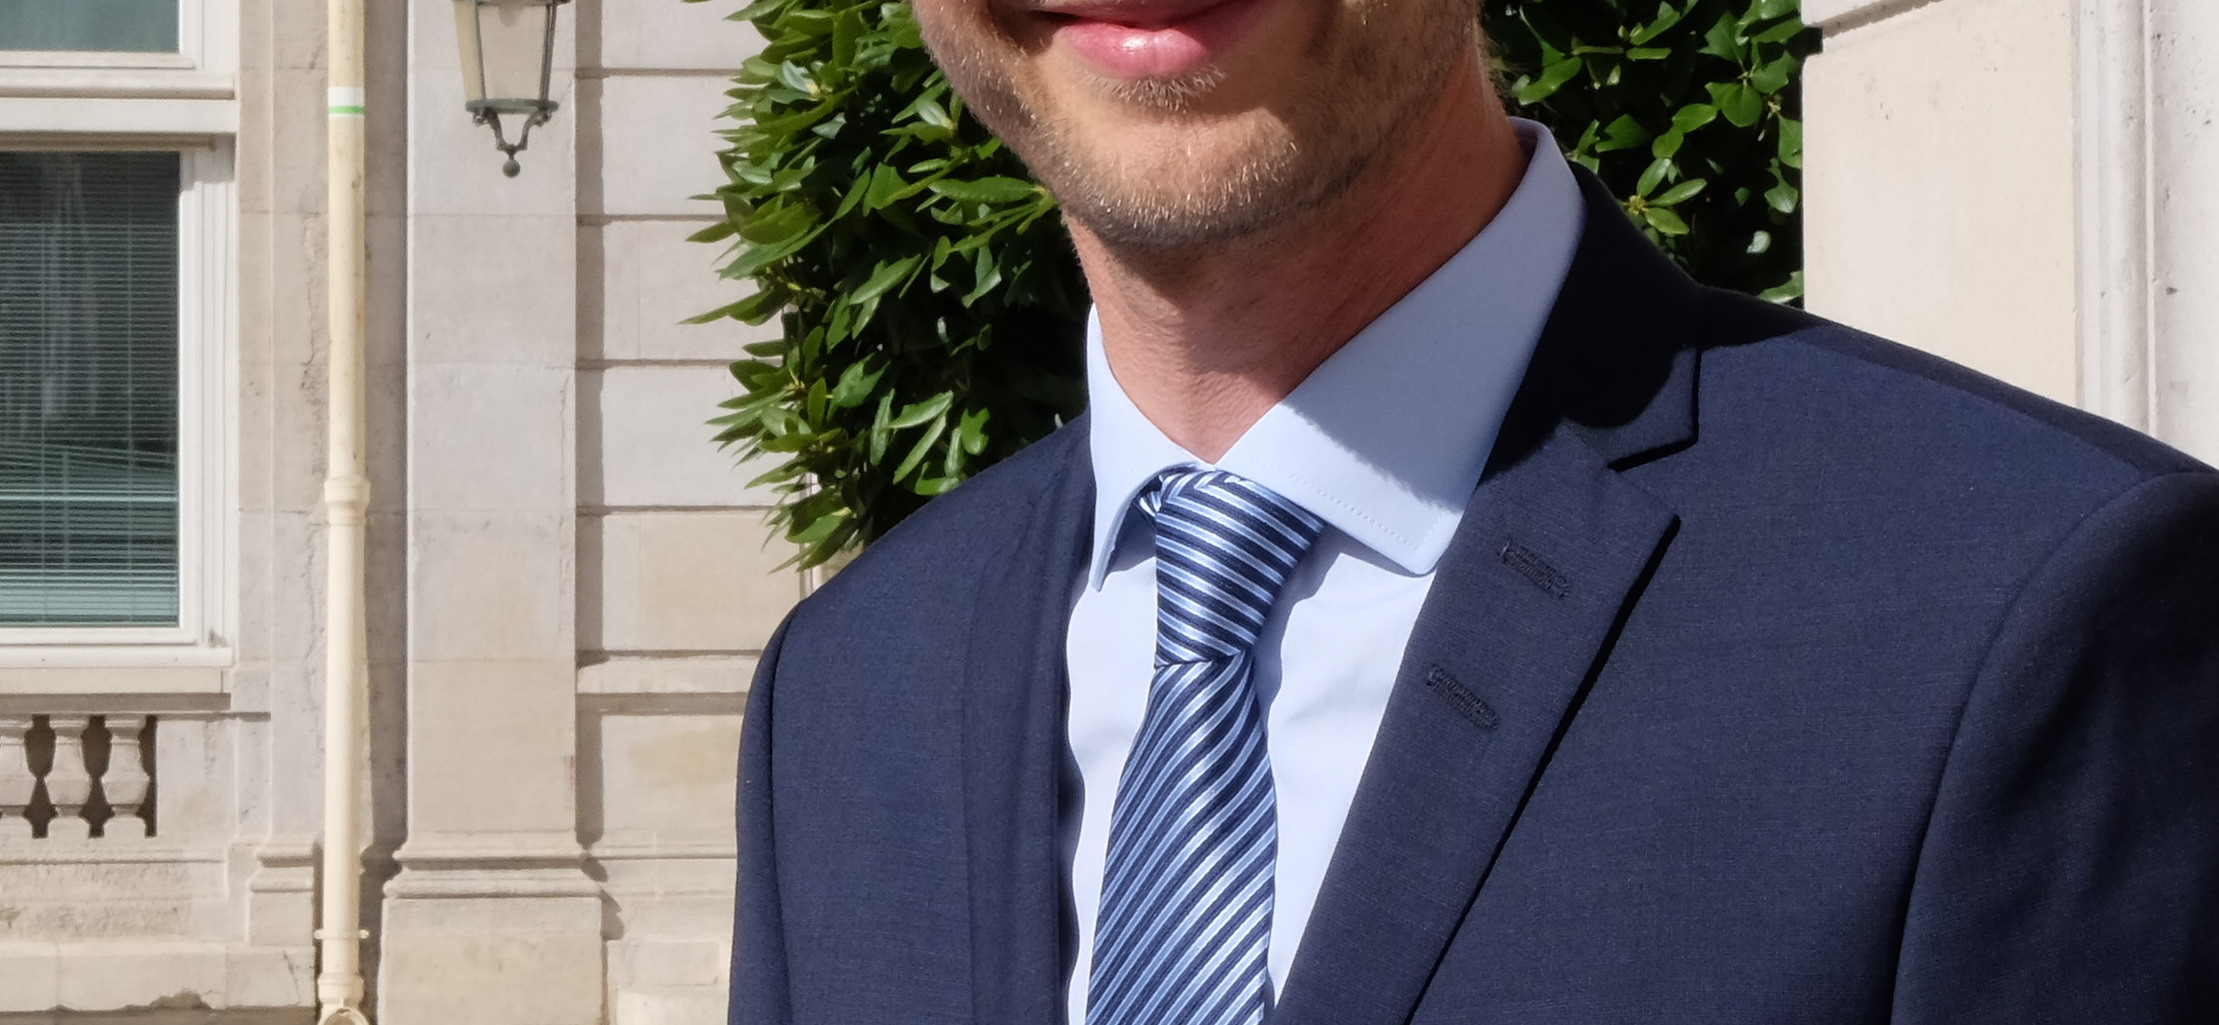 Chemise cravate club costume bleu marine